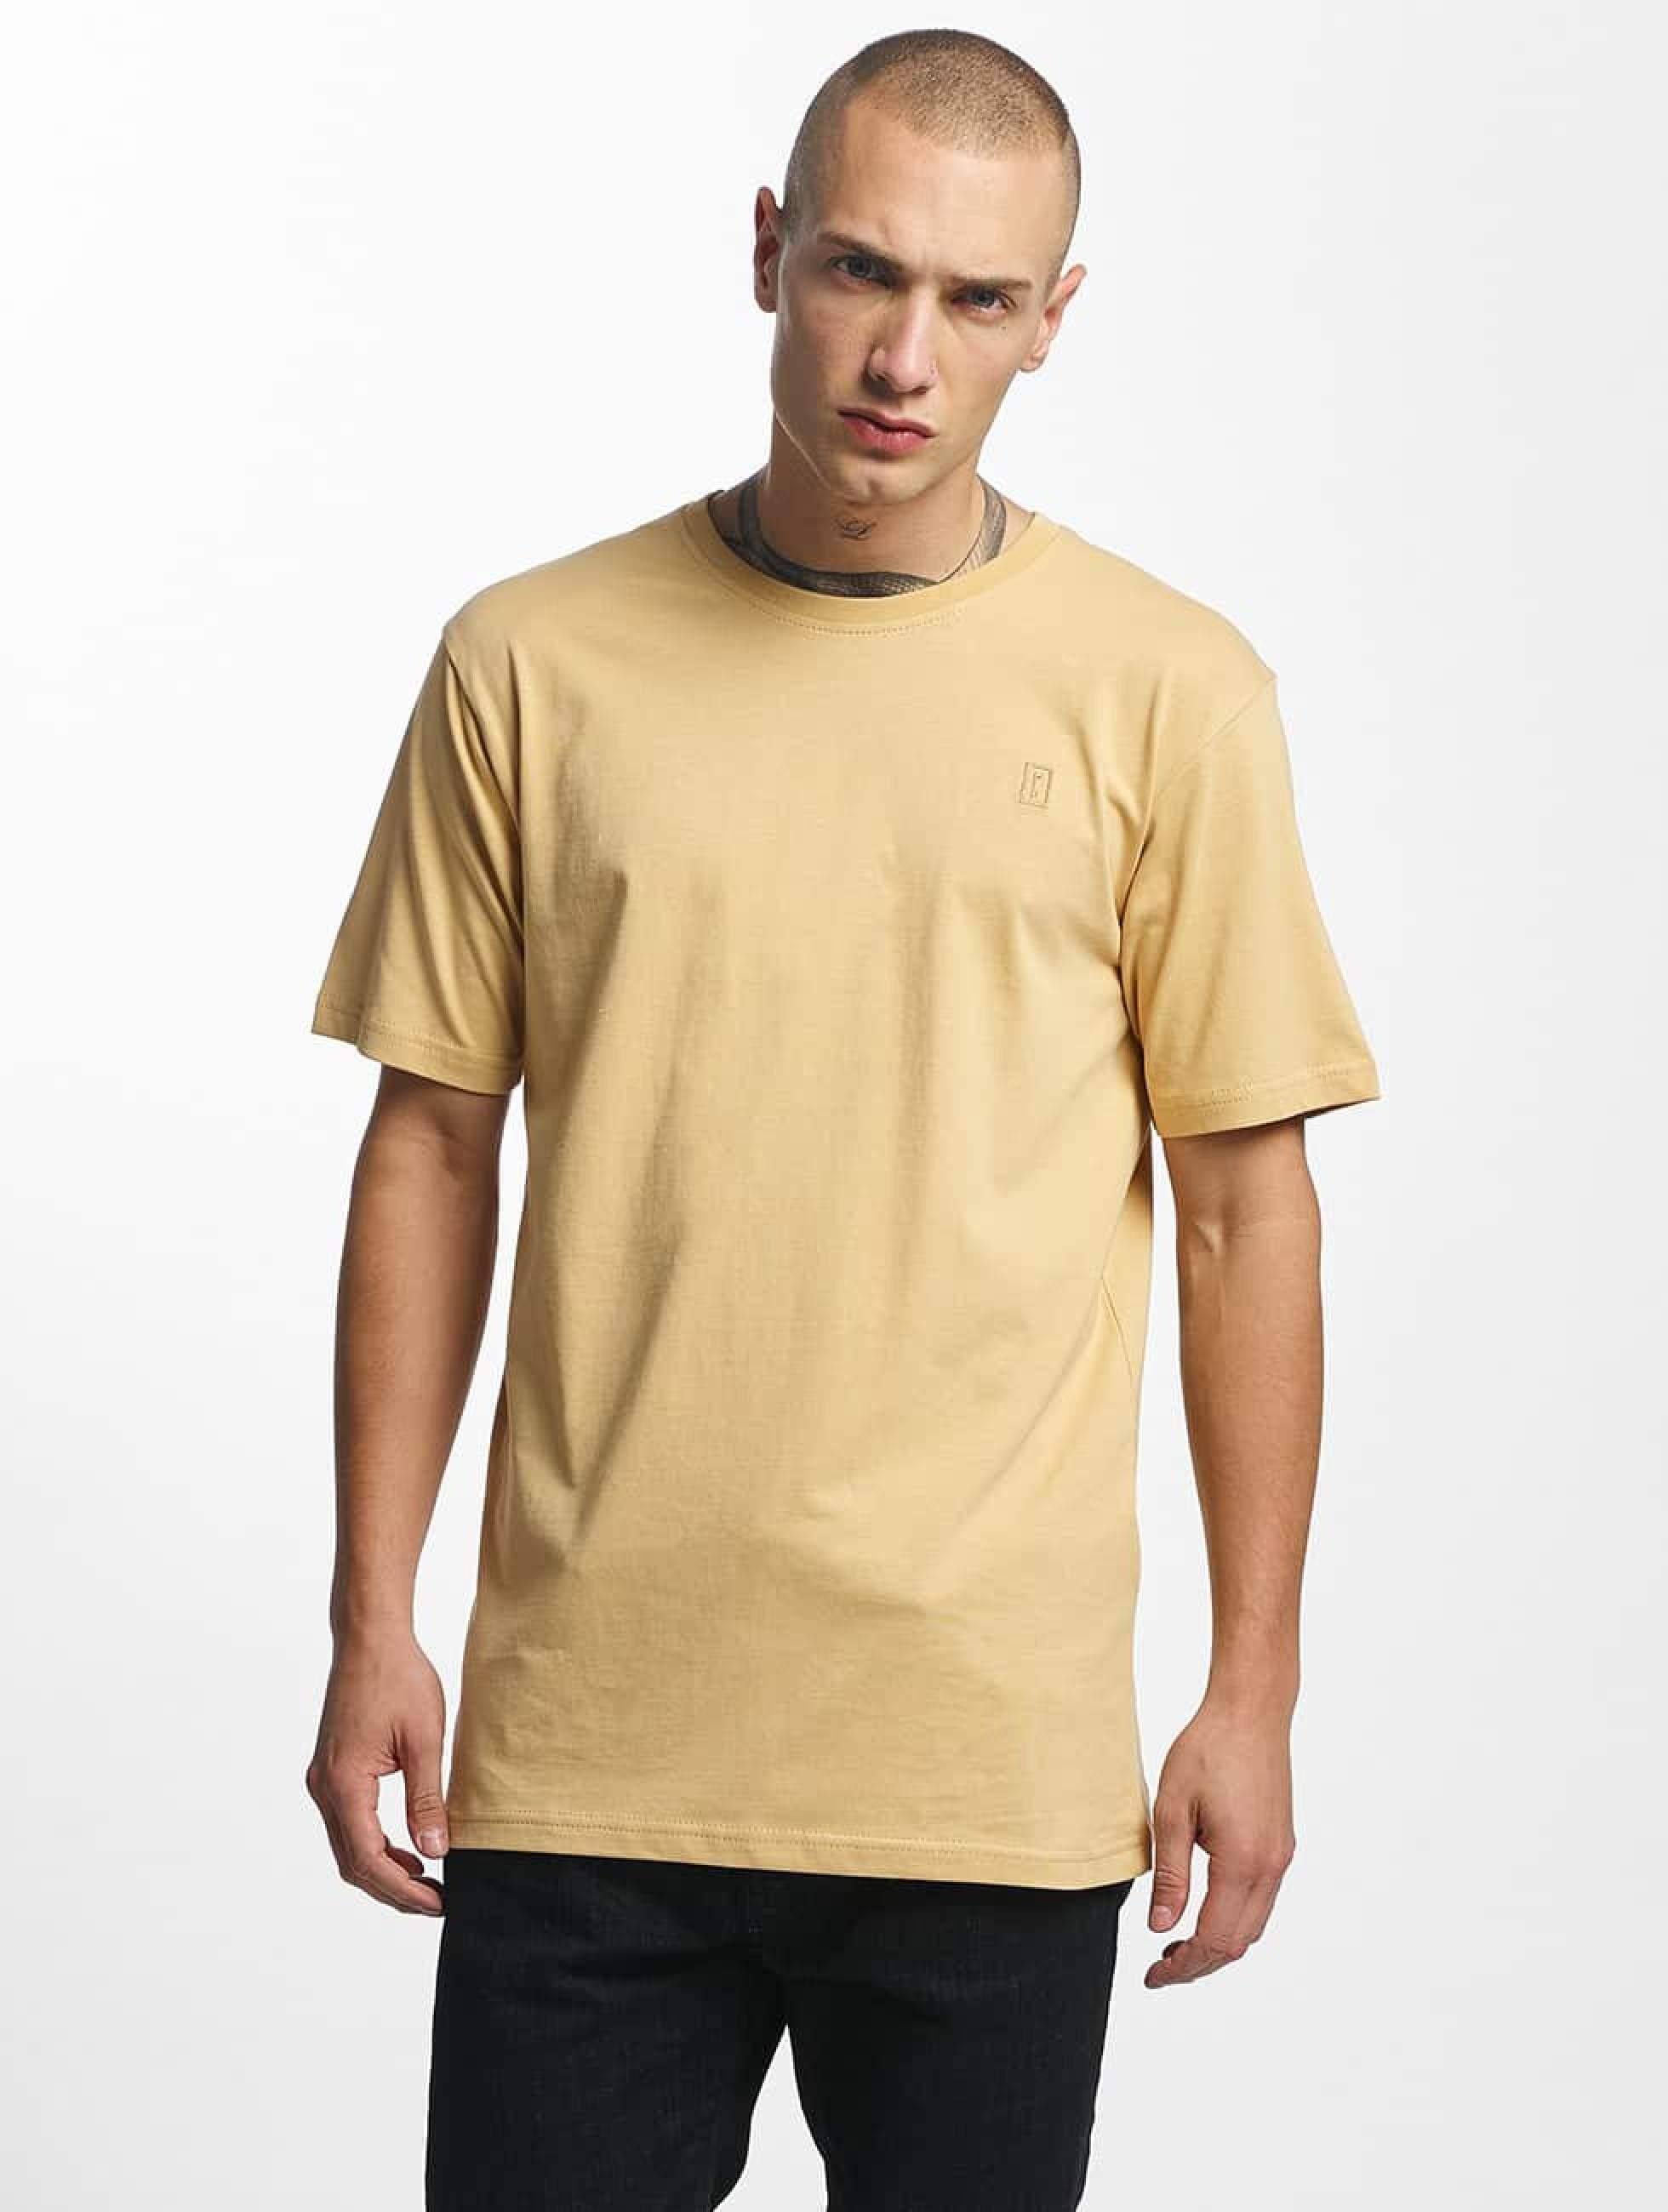 Cyprime / T-Shirt Titanium in beige L